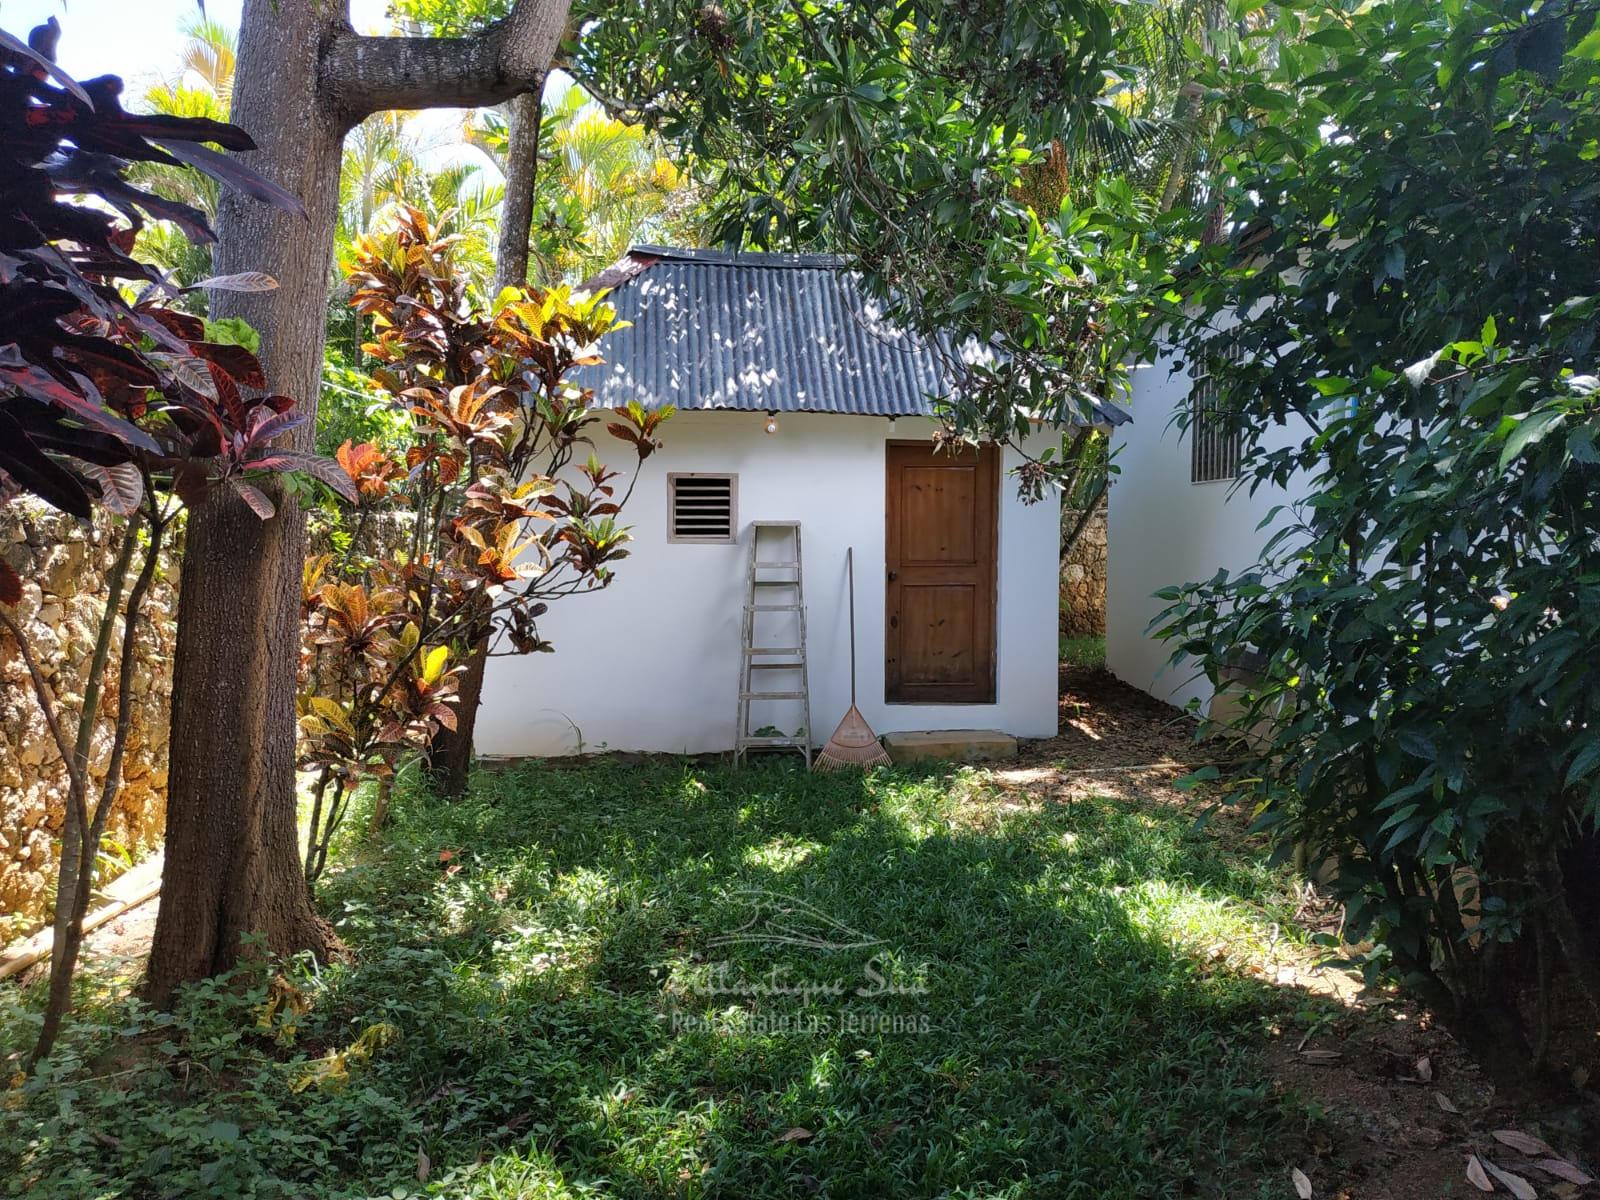 Villa Authentic Carribean Real Estate Las Terrenas Dominican Republic14.jpg